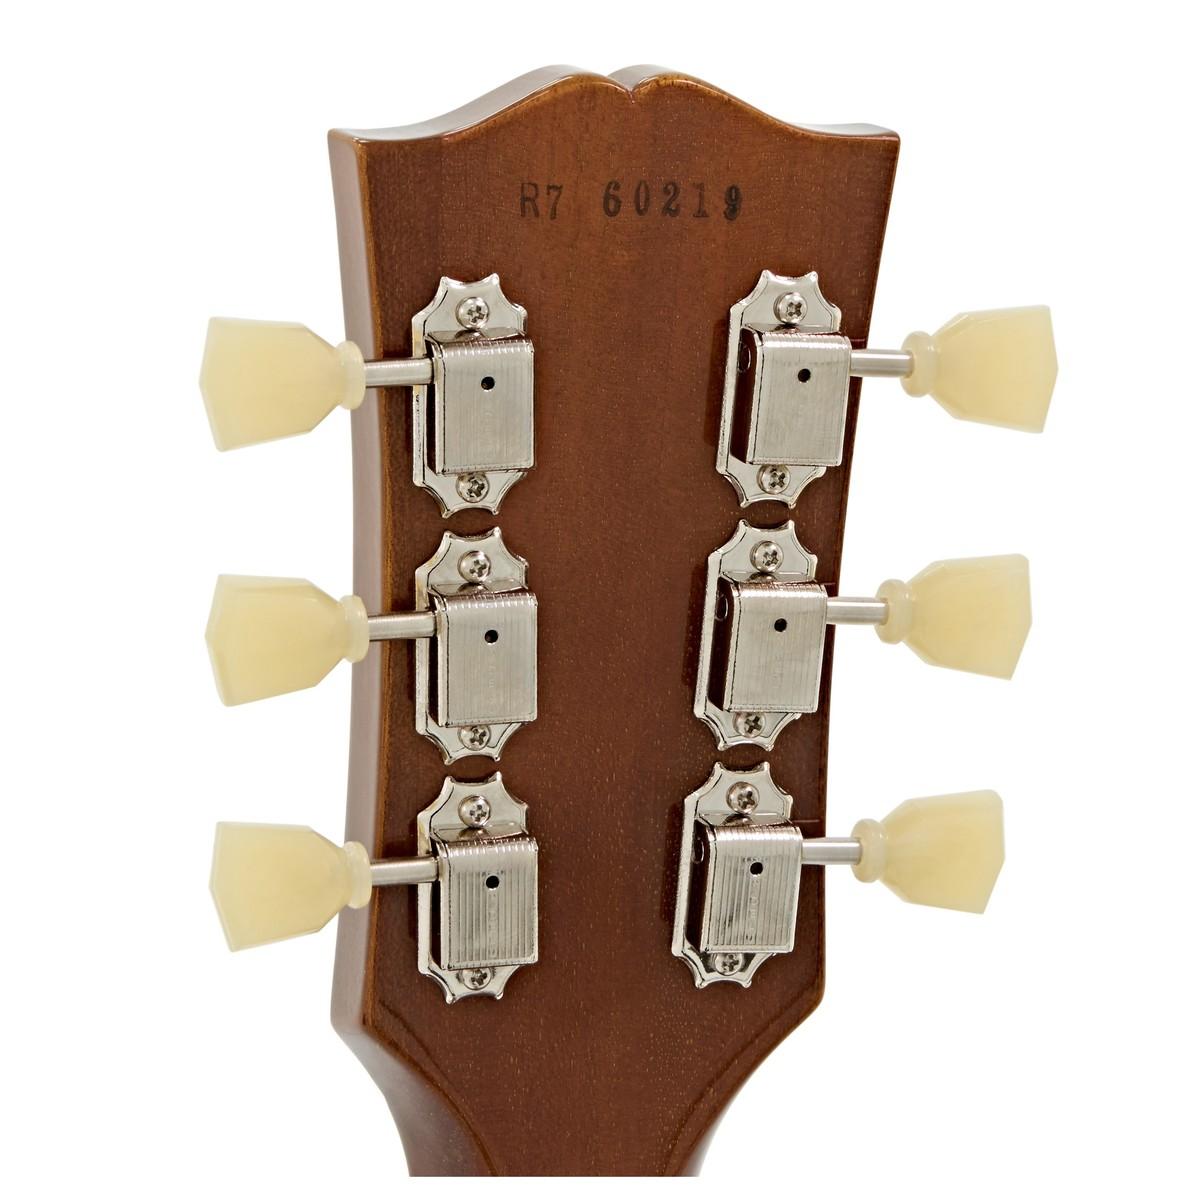 DISC Gibson Custom Shop Les Paul Standard Historic 1957 LH, Goldtop